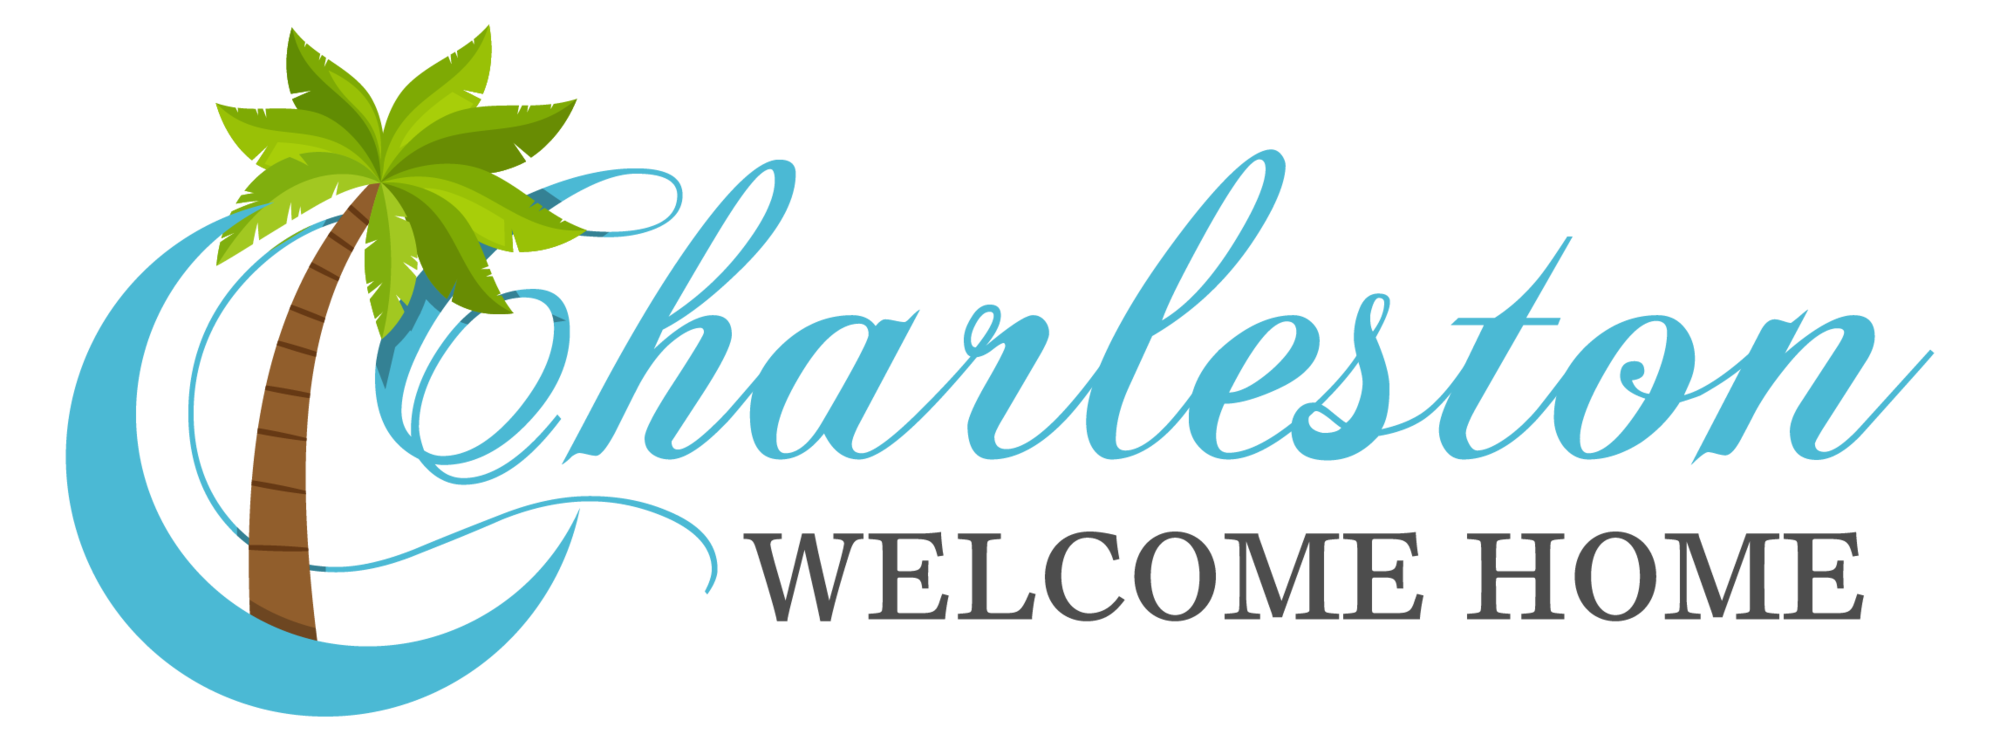 2000x741 Charleston Welcome Home